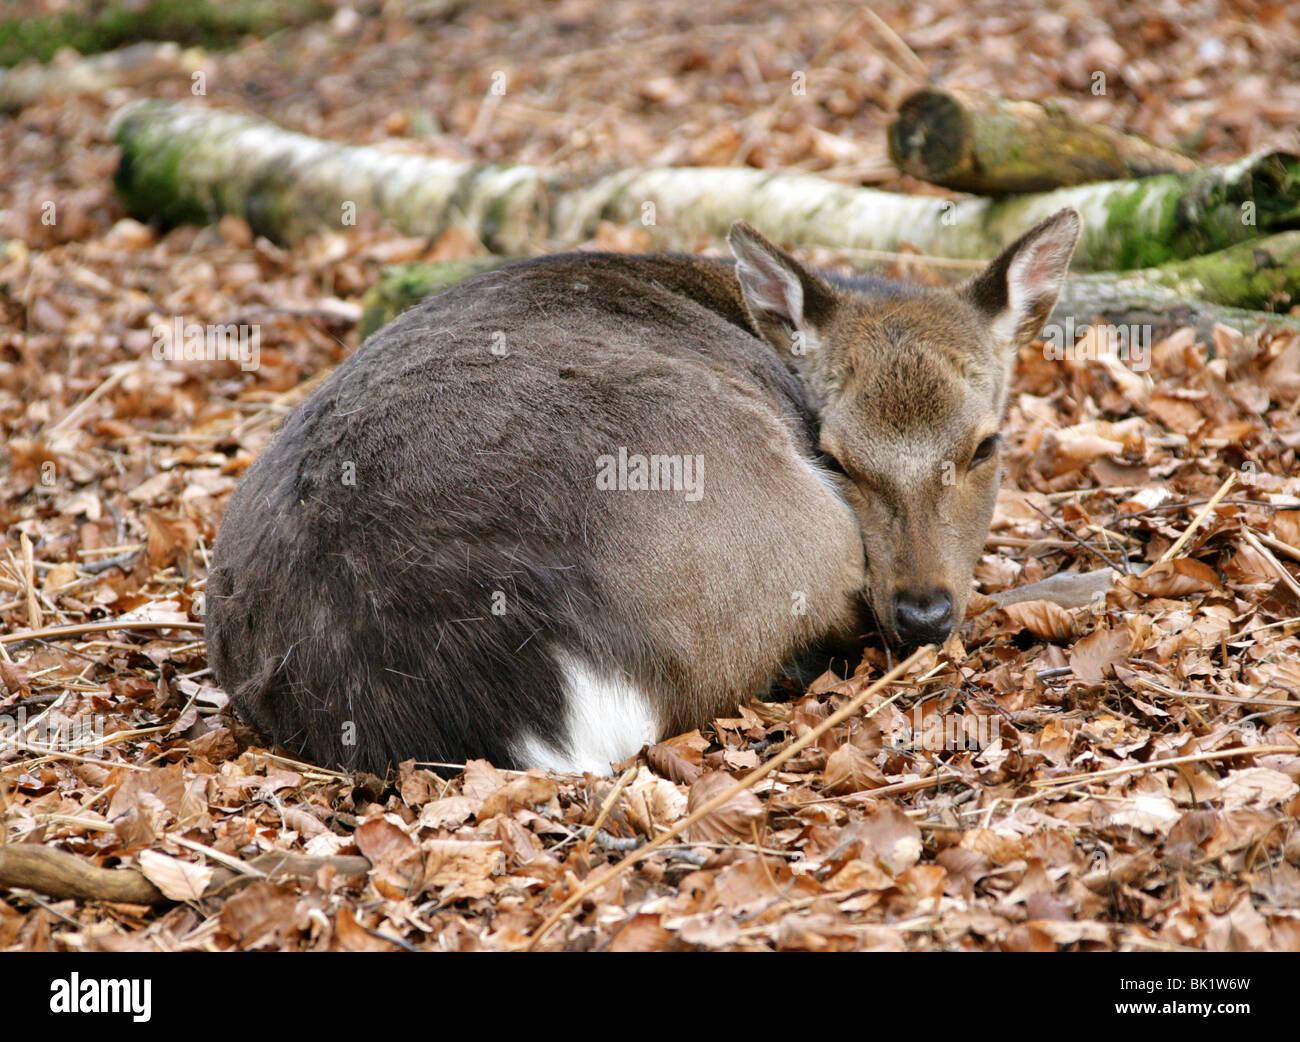 Sika Deer Fawn, Cervus nippon nippon, Cervidae. - Stock Image